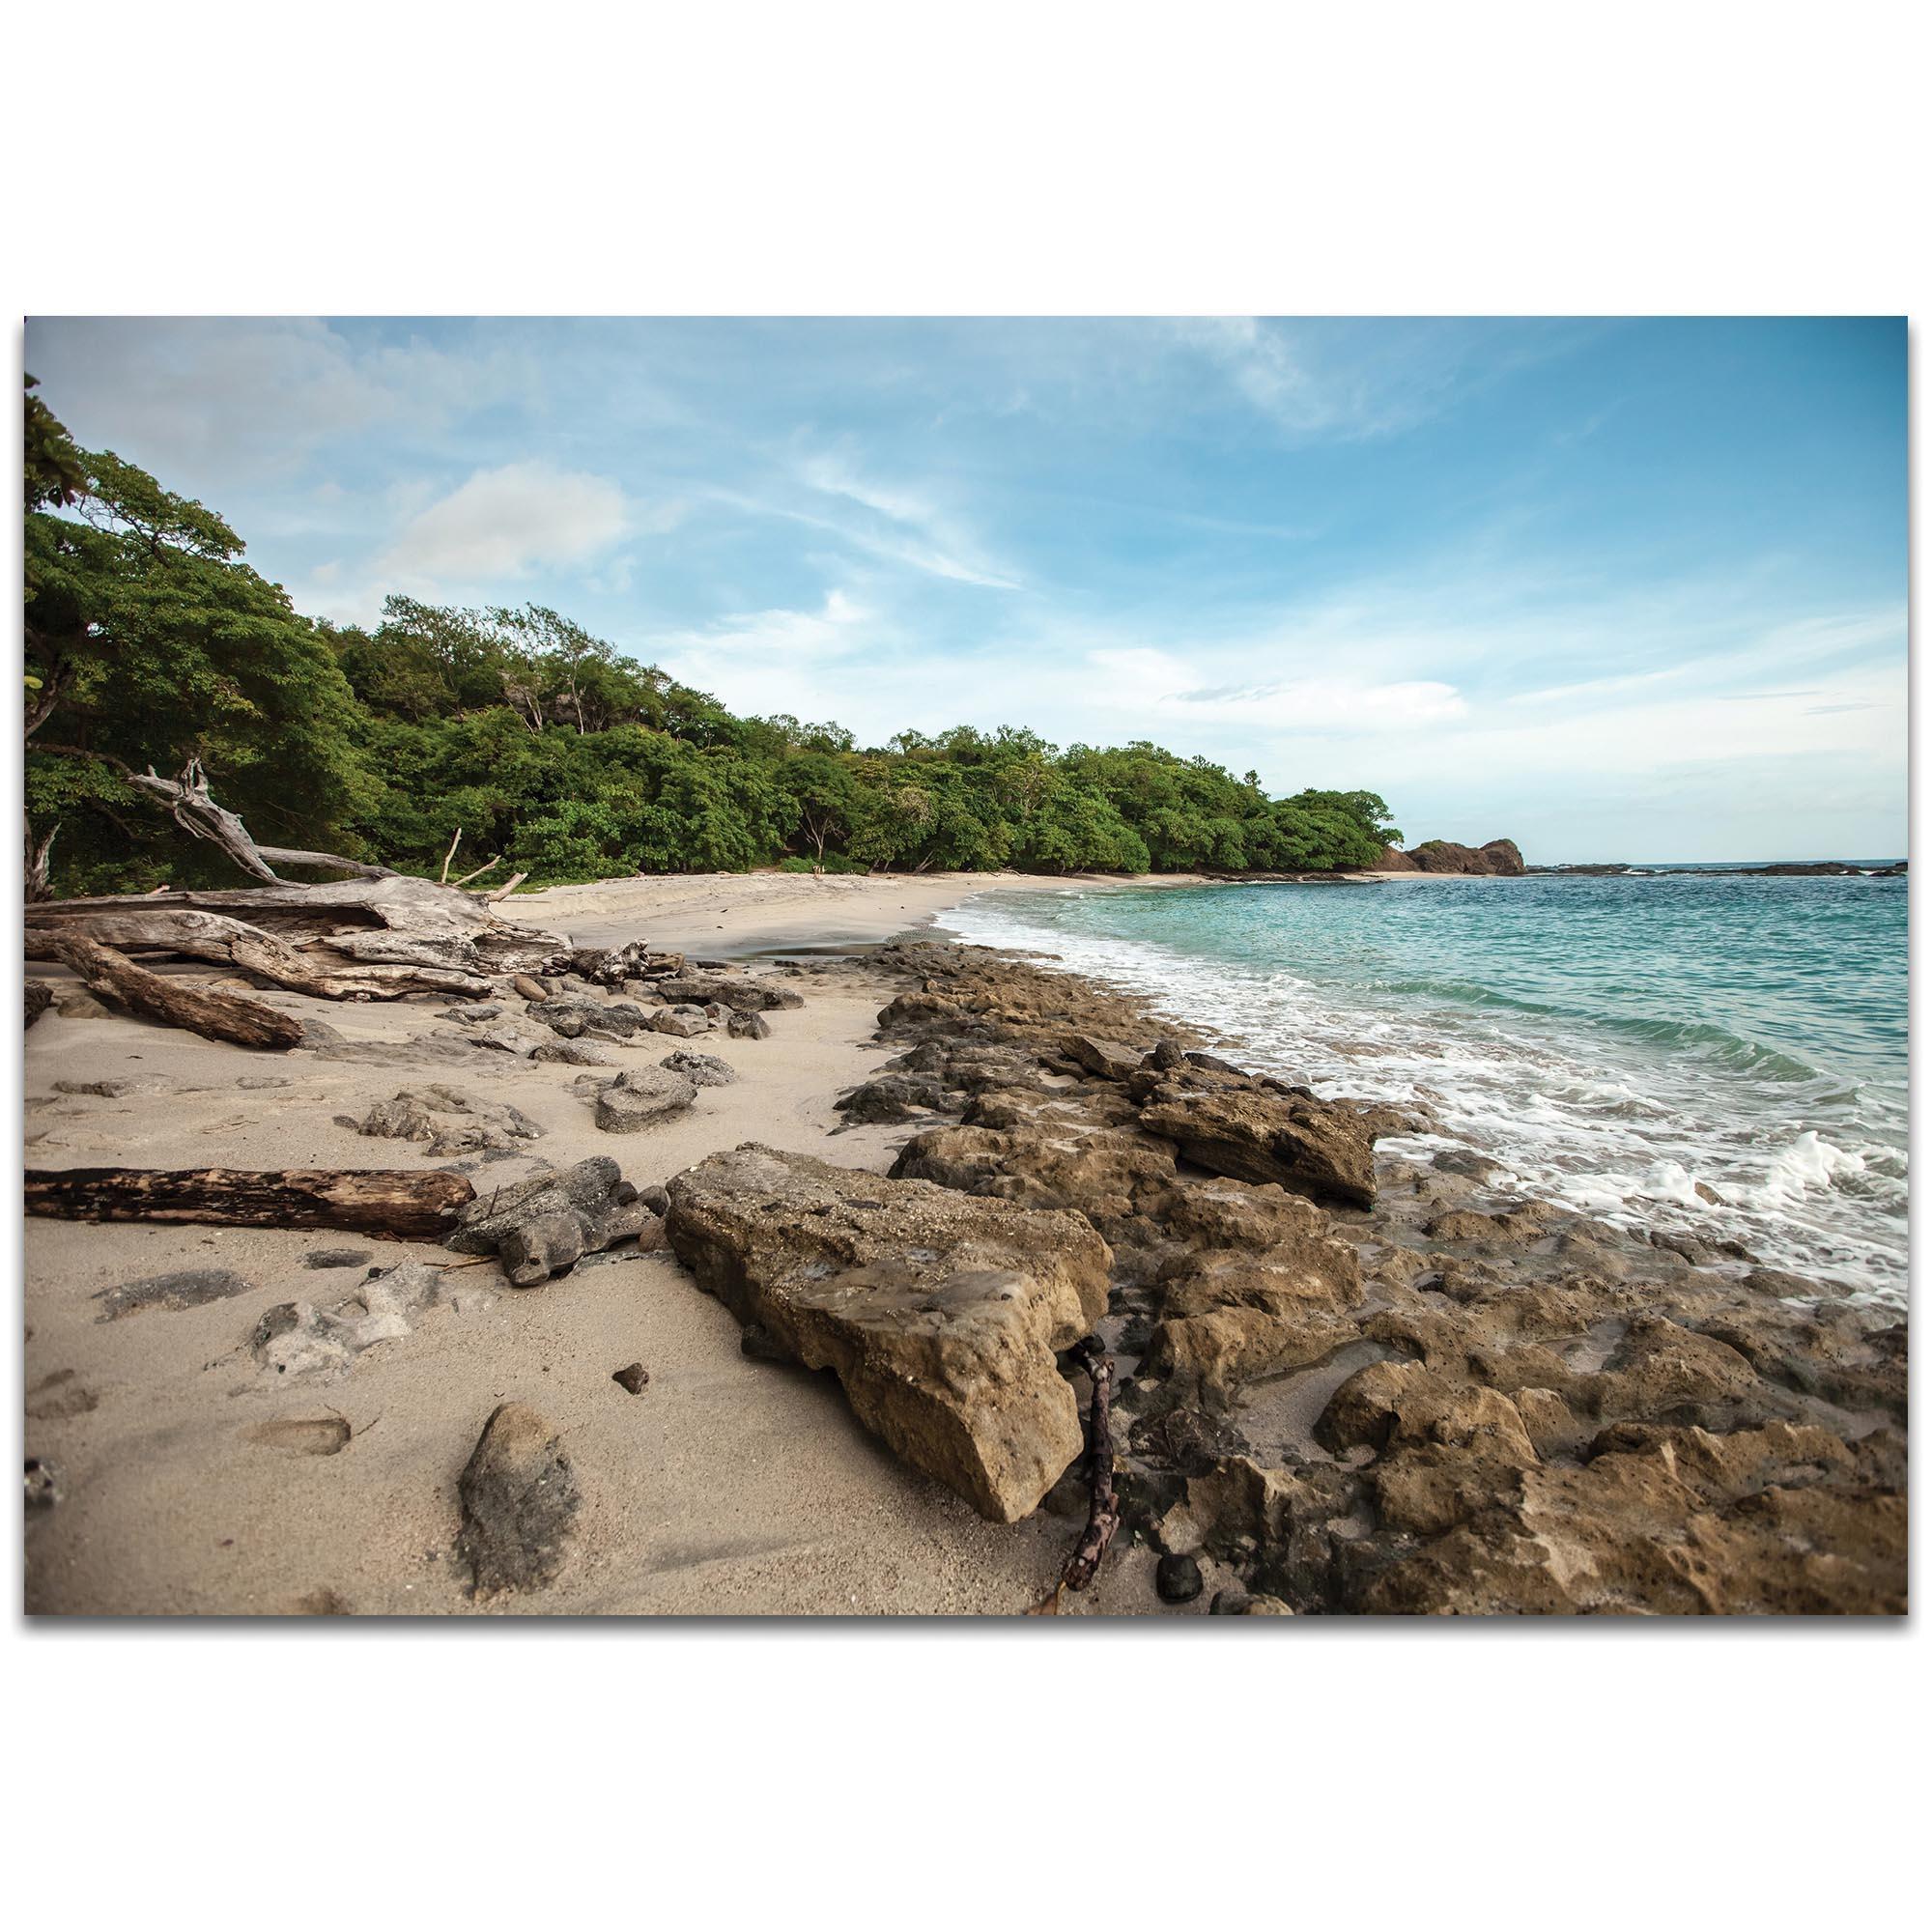 Metal Art Studio – Tropical Junglemeirav Levy – Coastal Wall For Coastal Wall Art (Photo 14 of 20)